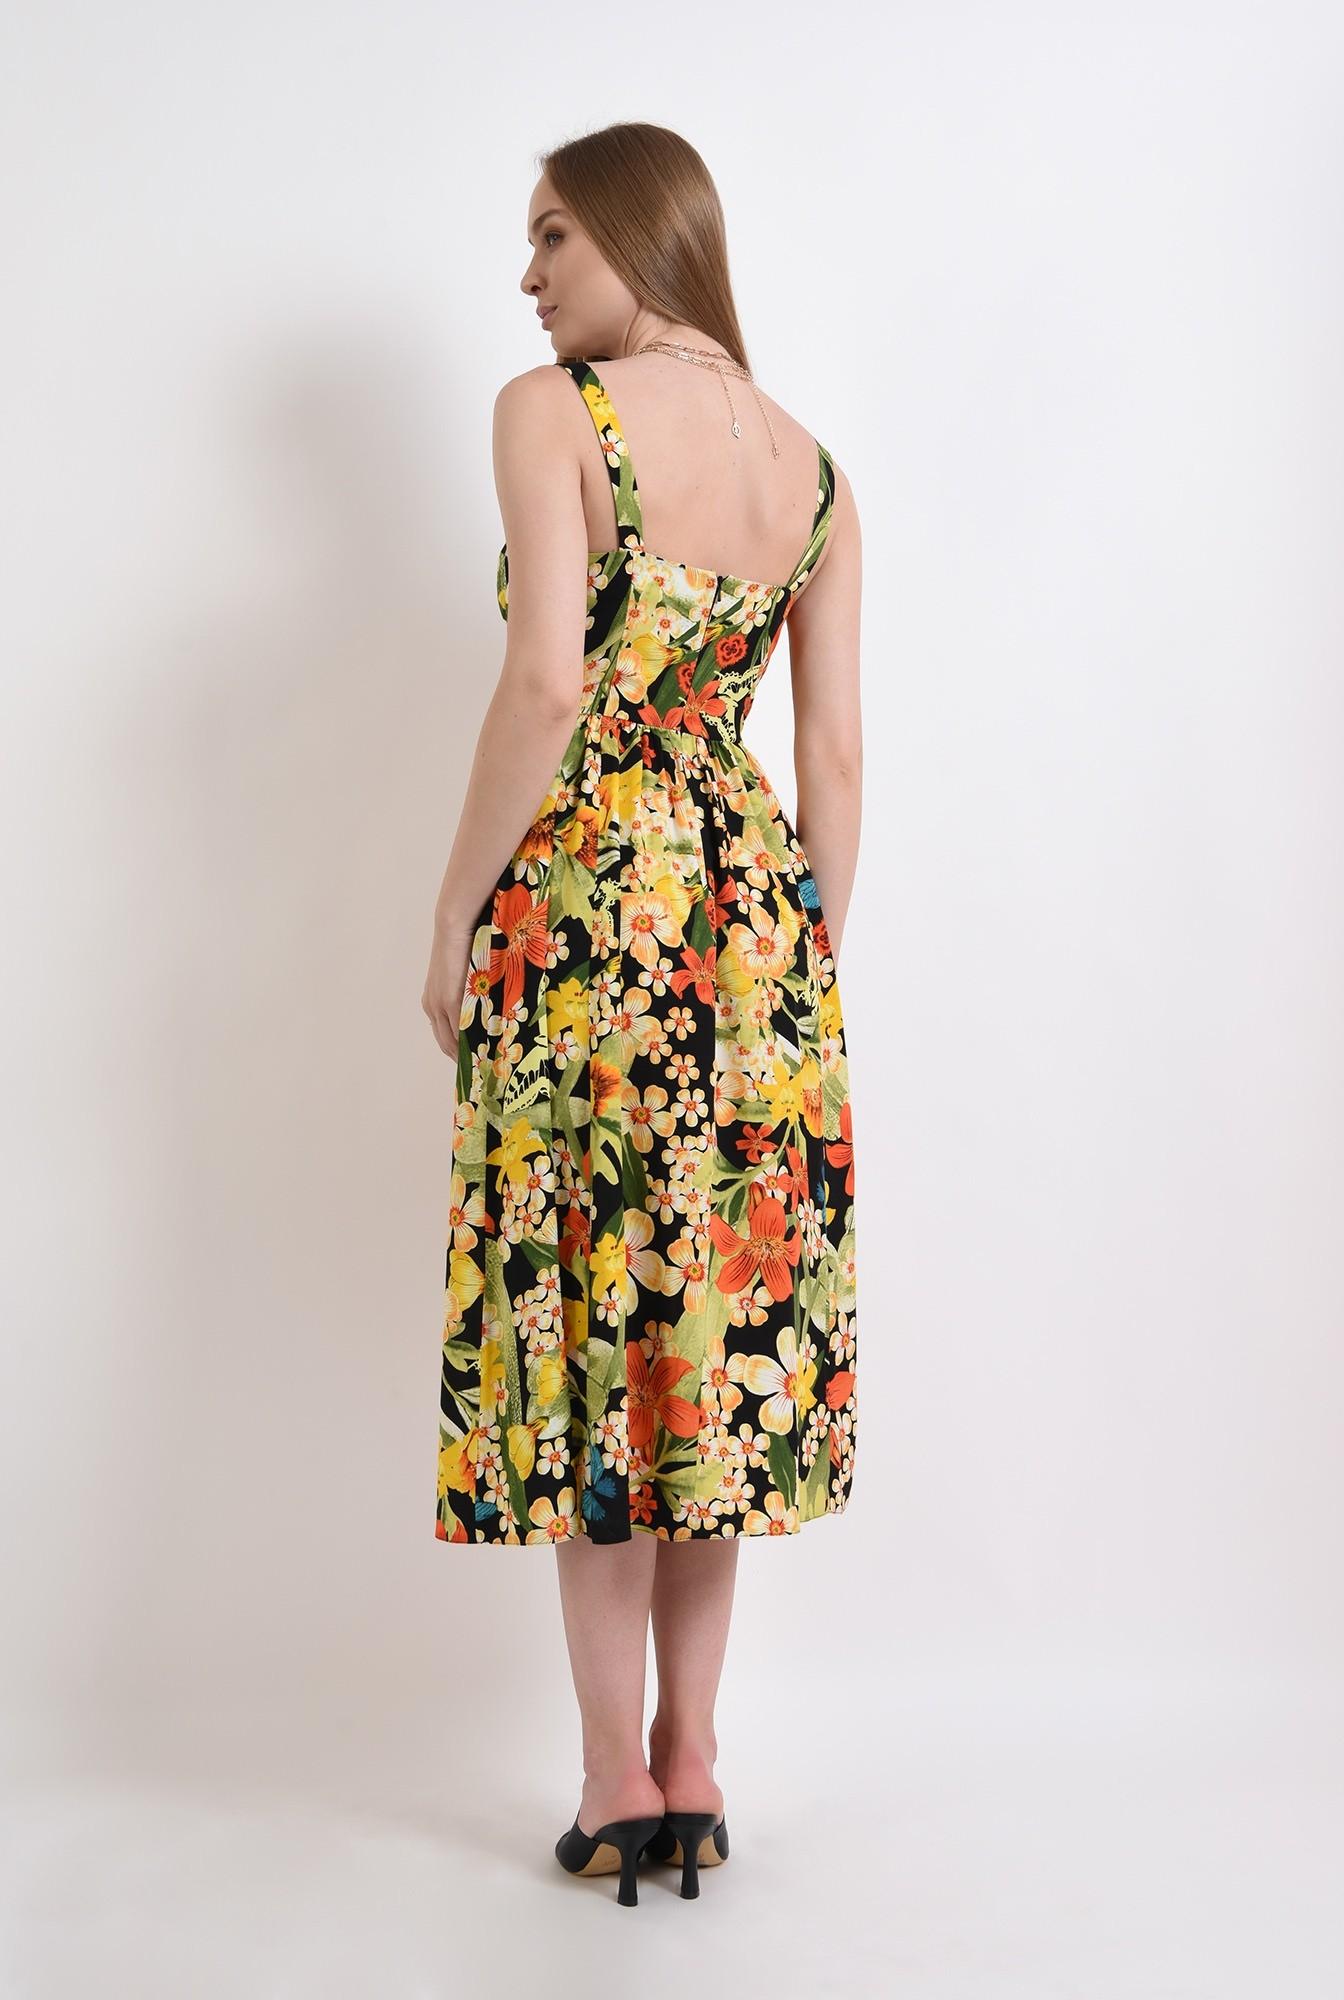 2 - rochie midi, evazata, cu flori